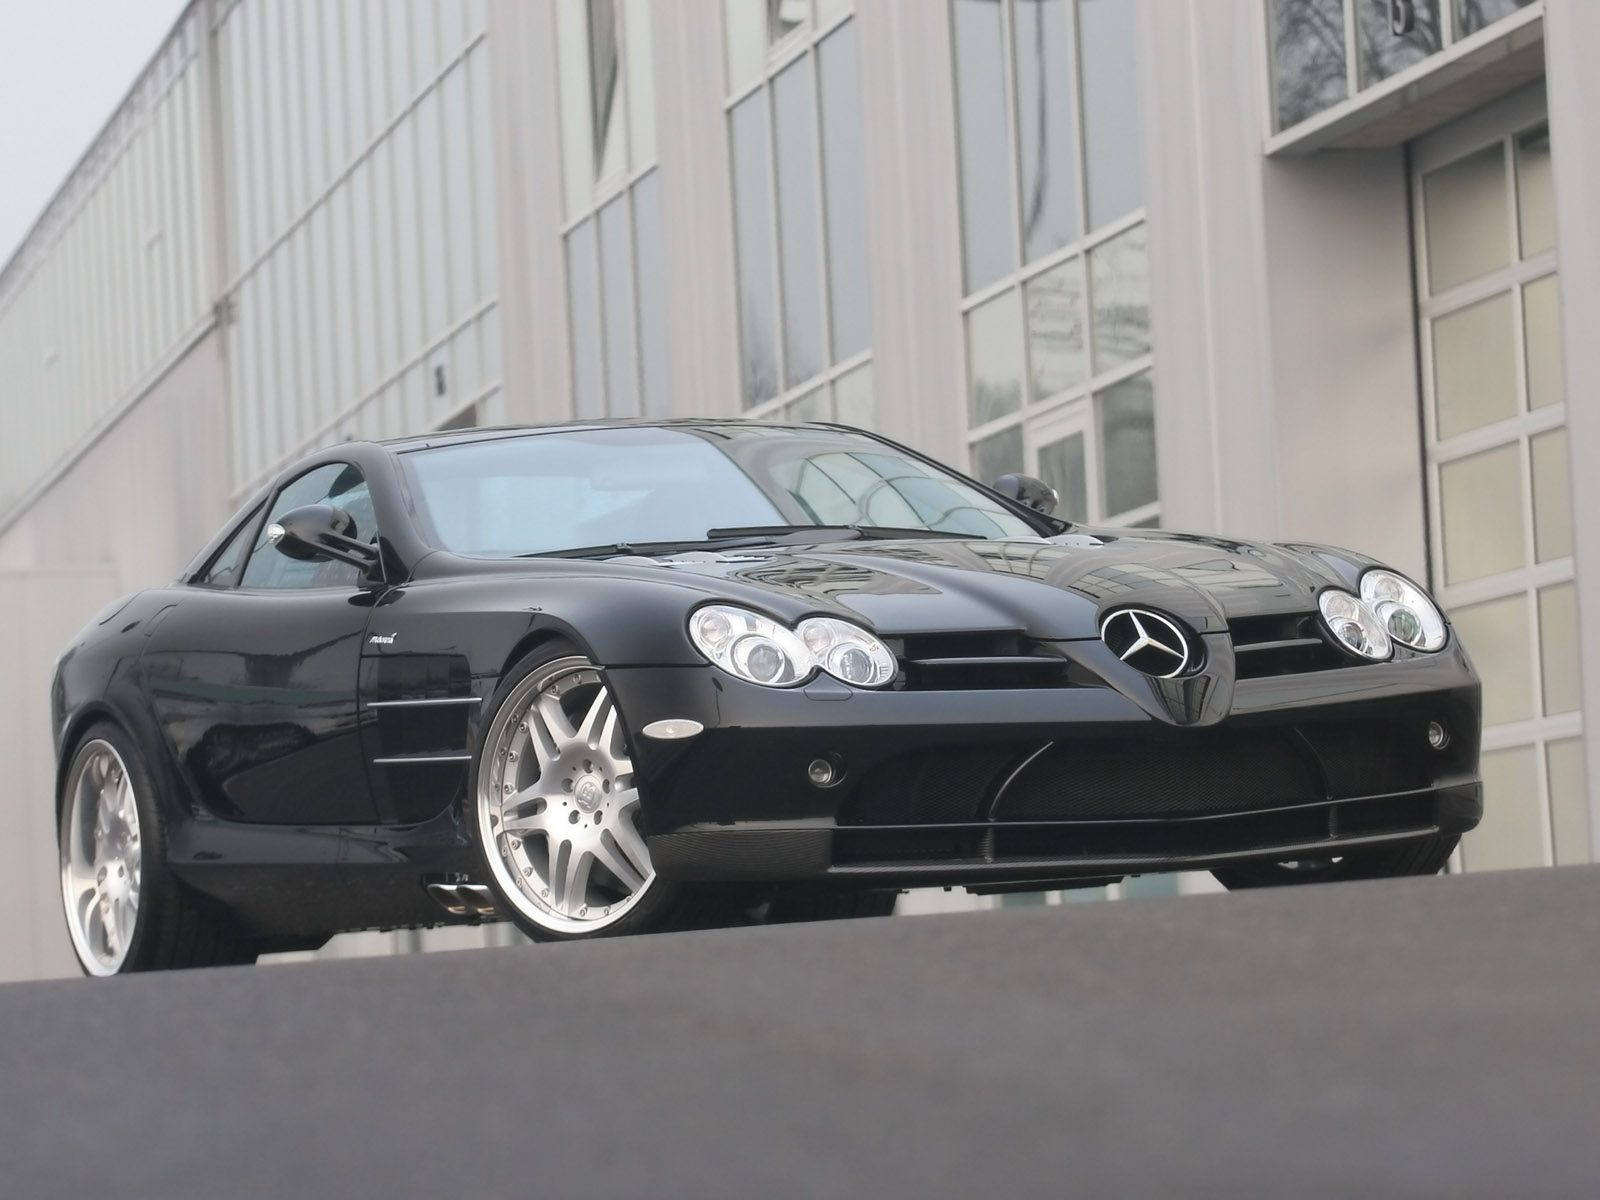 http://3.bp.blogspot.com/-9DBYyc3WFic/UBlge7ej9SI/AAAAAAAAABc/4w6QNWnwwgw/s1600/Brabus_SLR_McLaren_based_on_Mercedes-Benz_SLR_McLaren.jpg